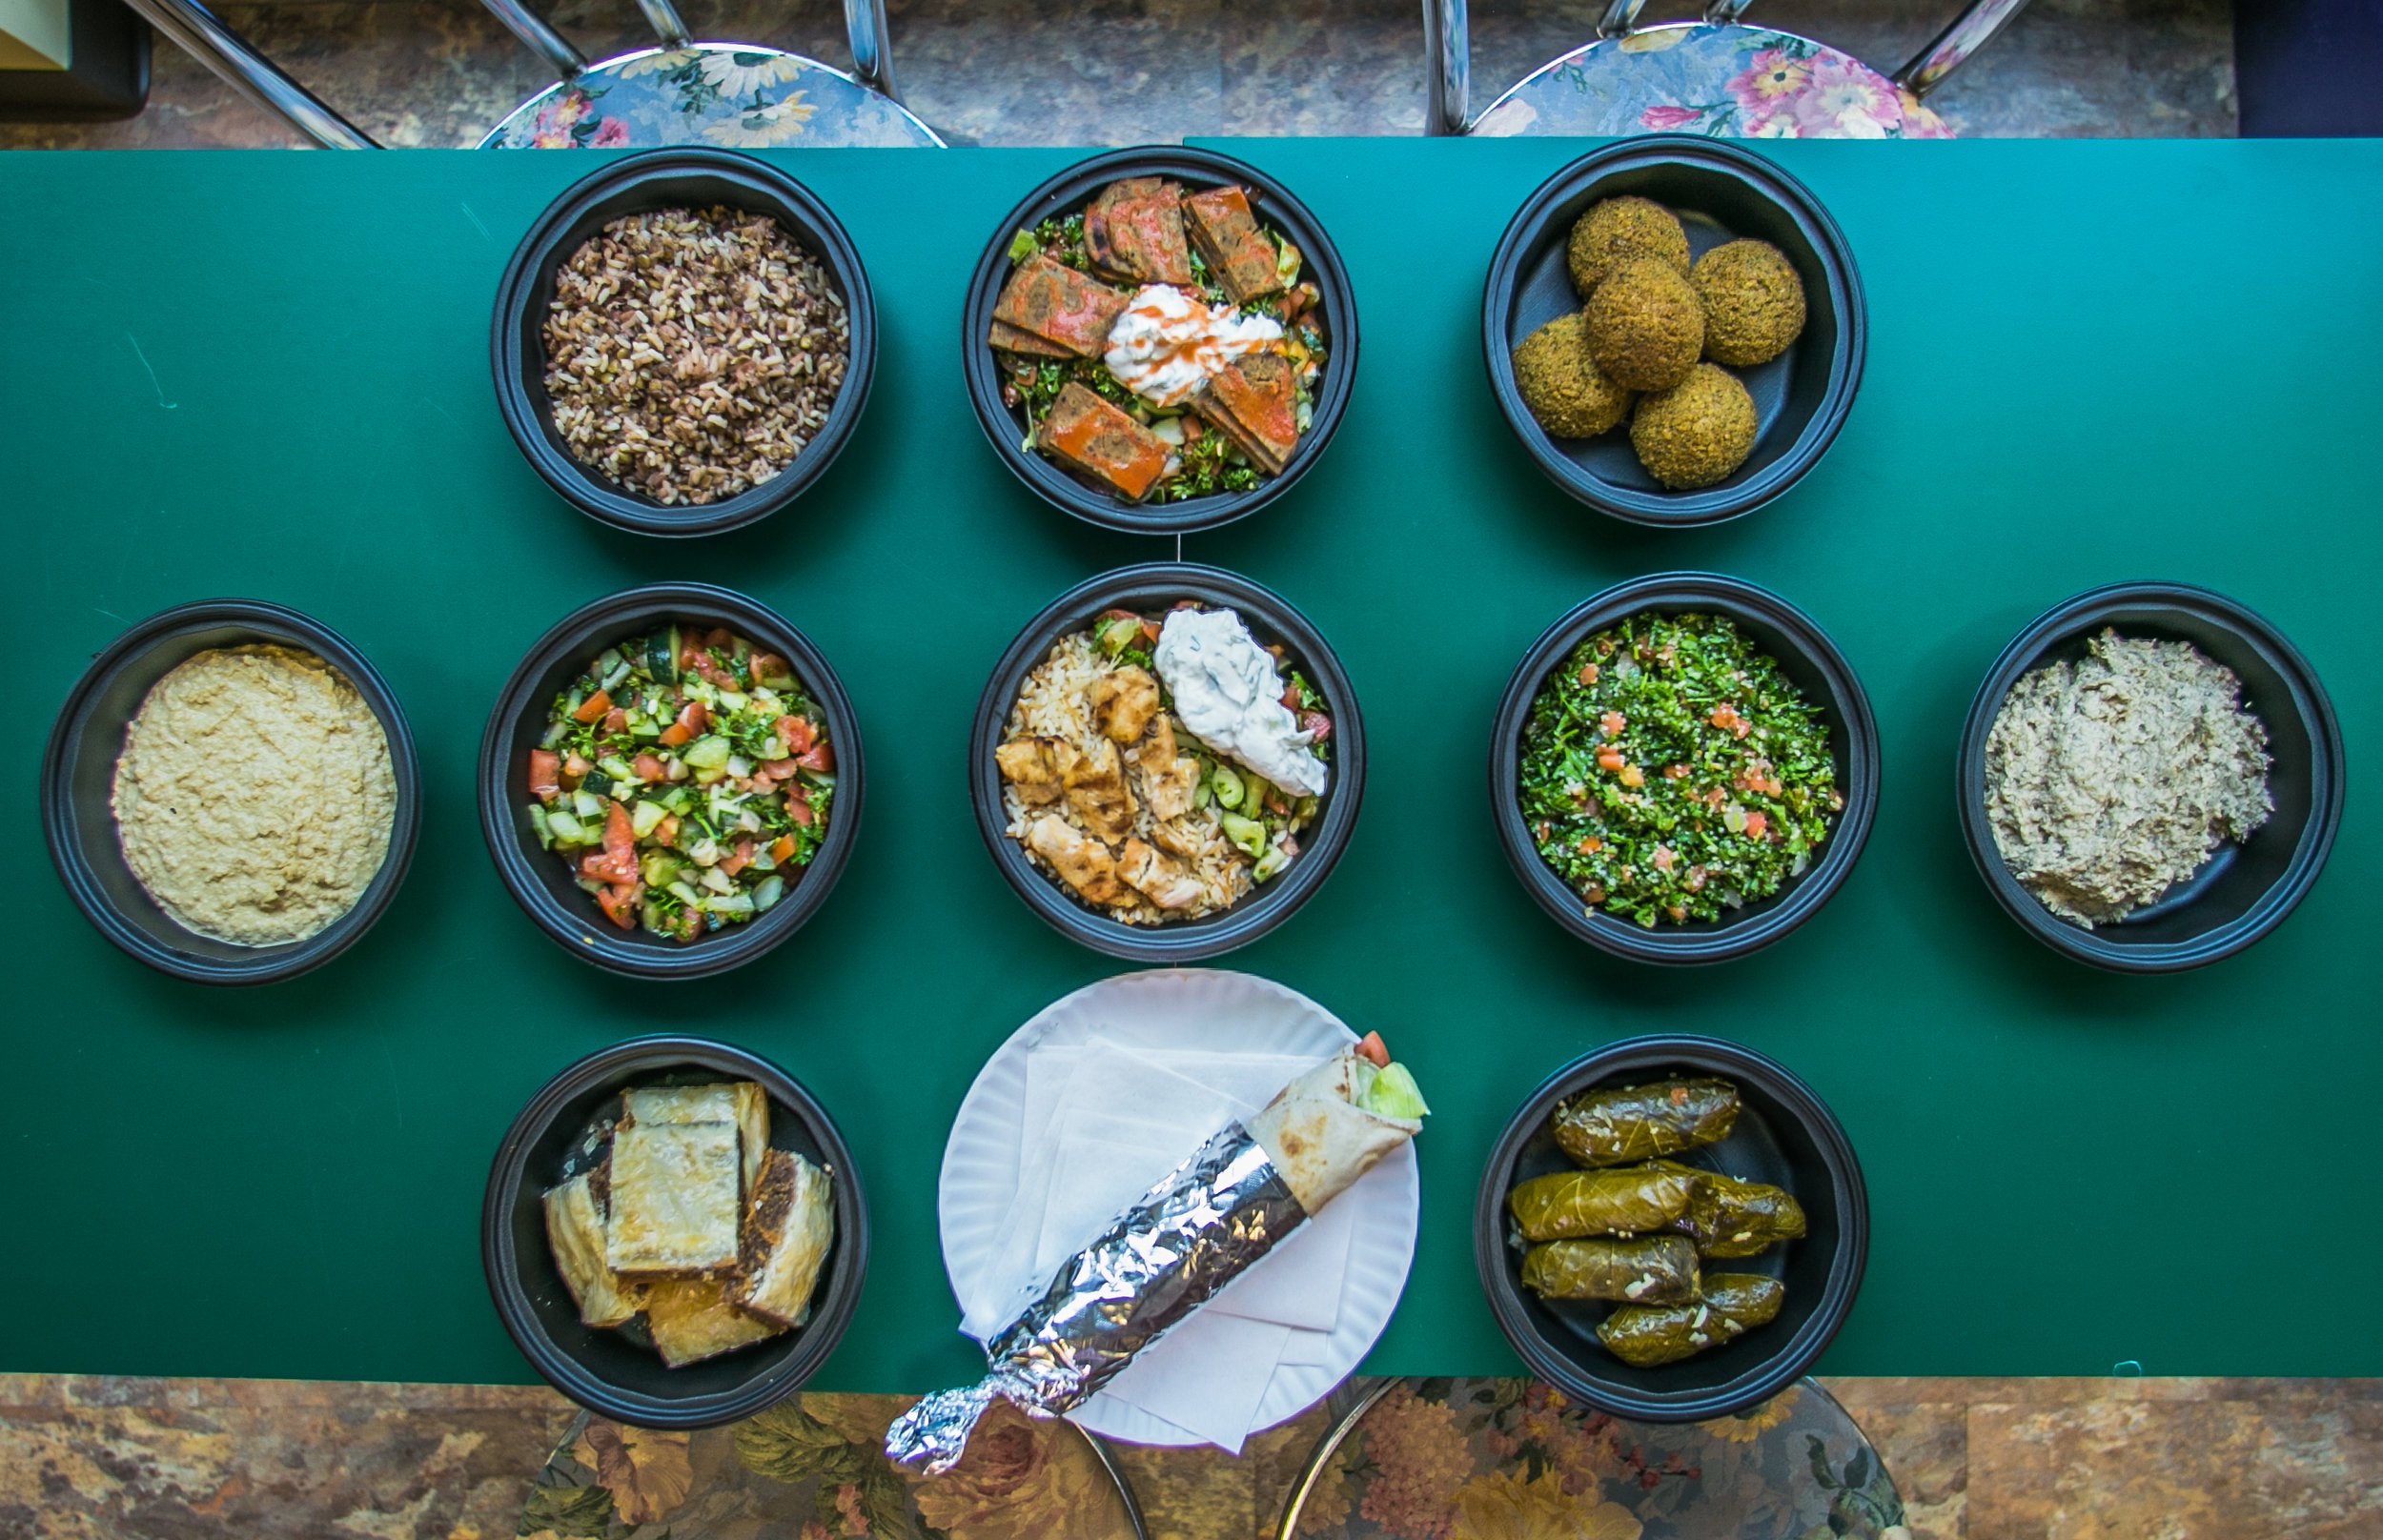 Shawb's Mediterranean Grill - UberEats